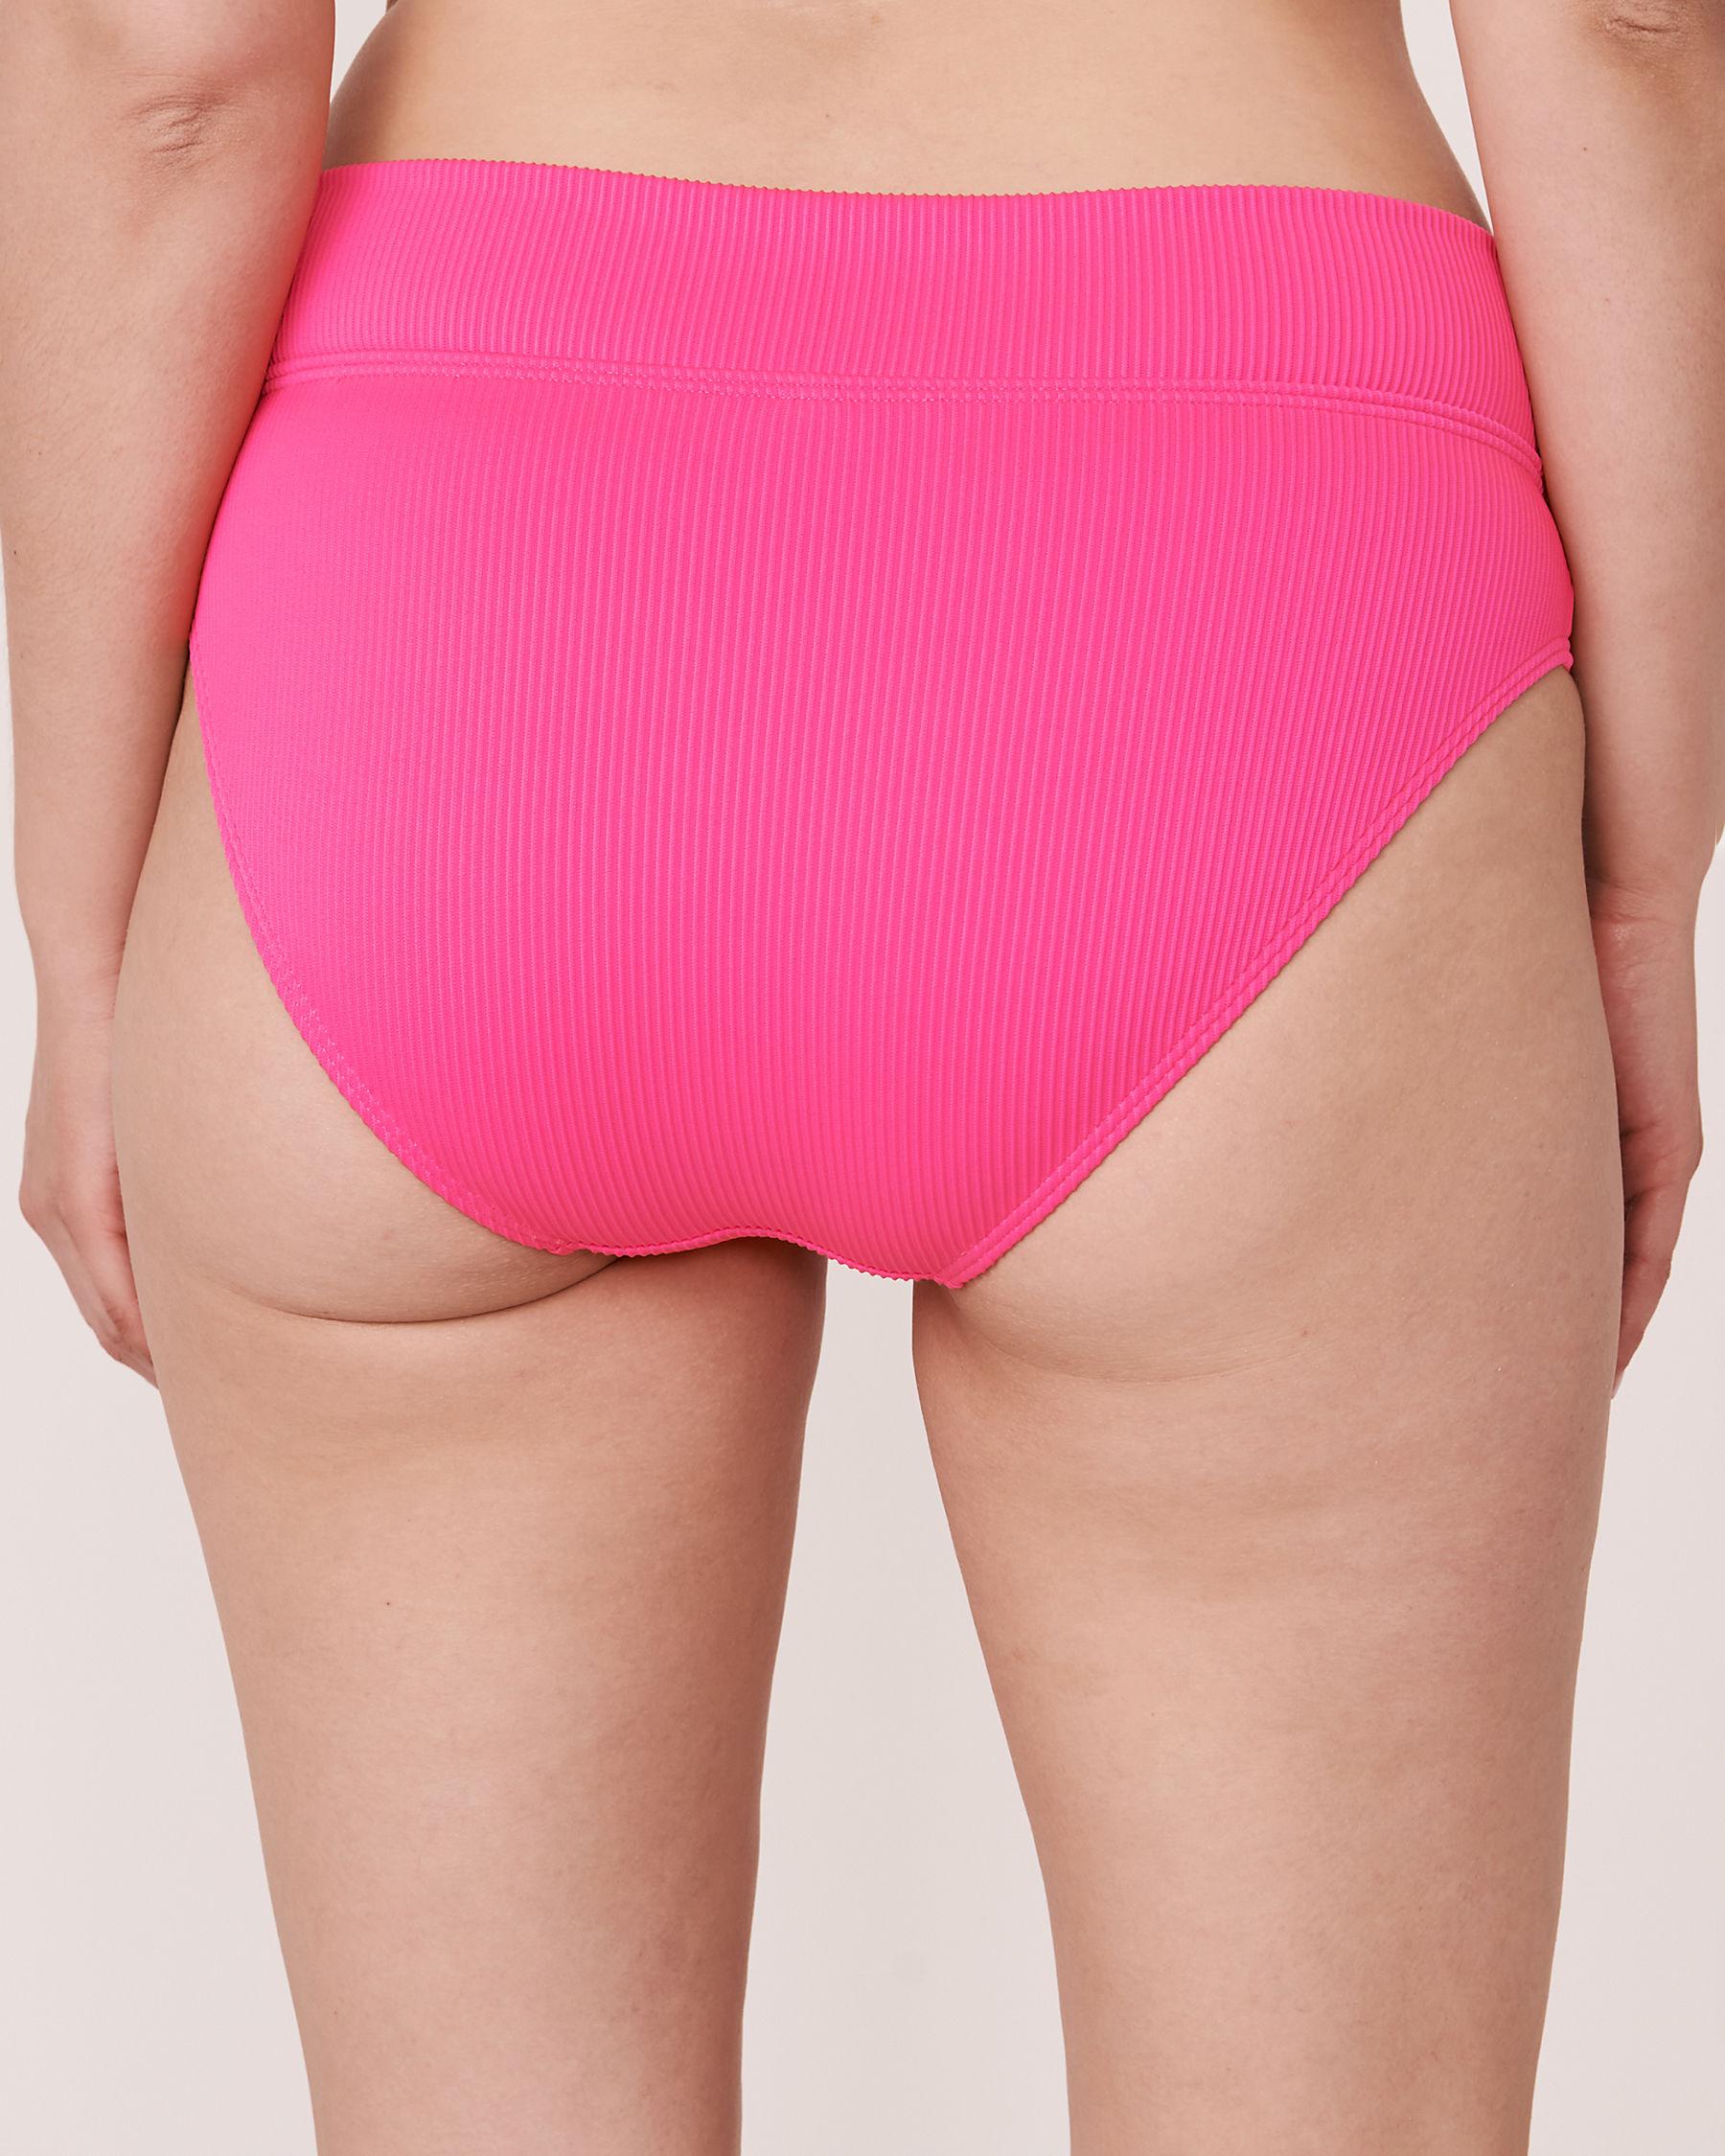 LA VIE EN ROSE AQUA Bas de bikini bande de taille pliable en fibres recyclées TOOTSIE RIB Rose néon 70300063 - Voir4